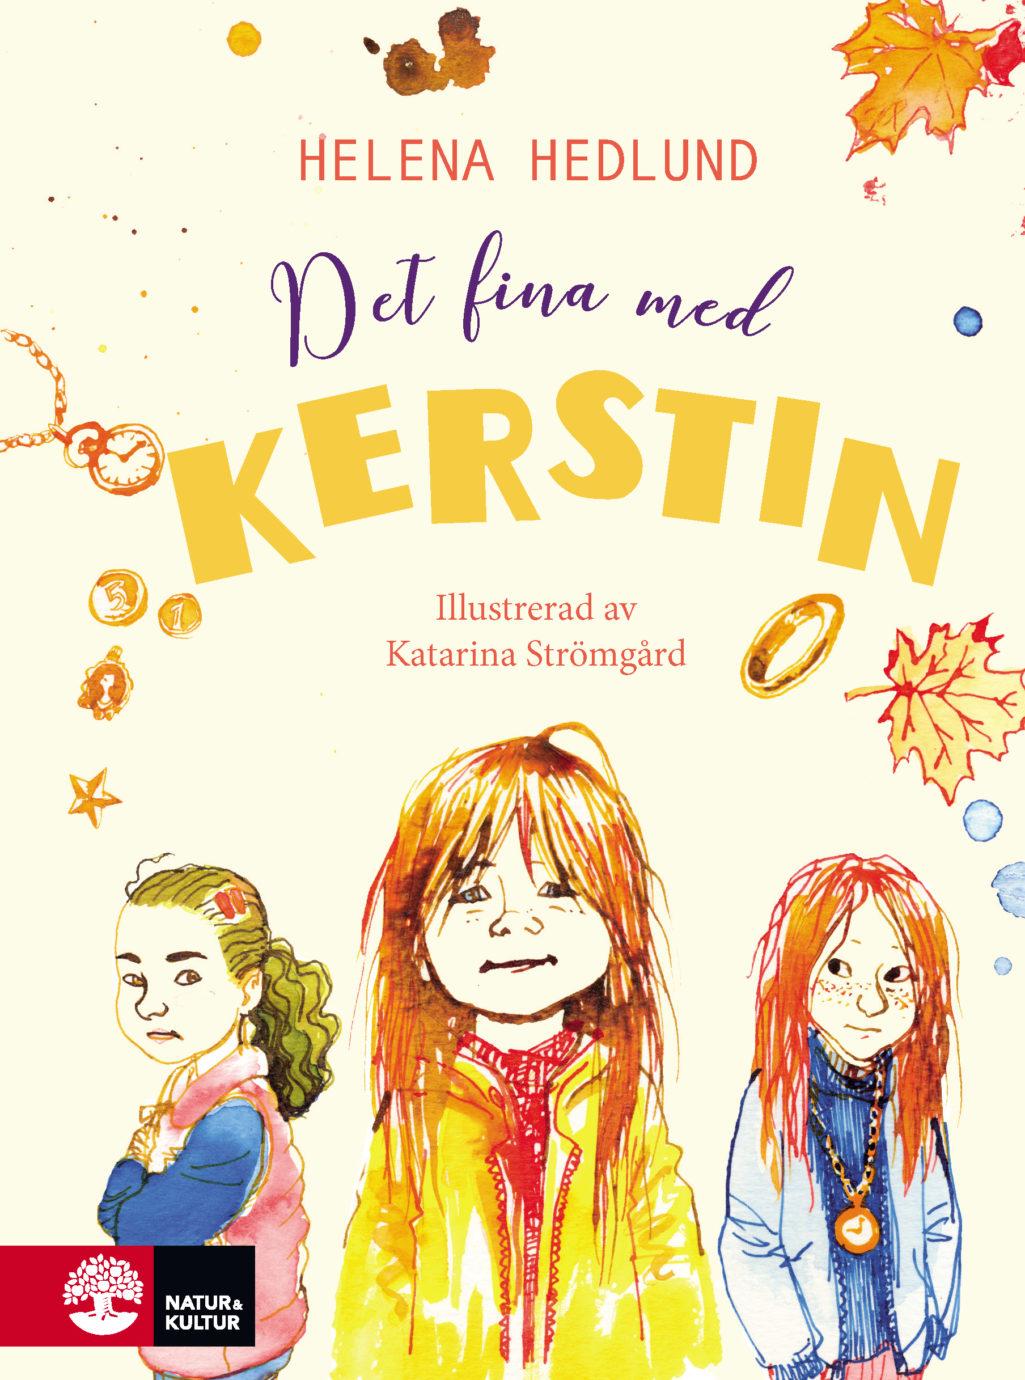 det-fina-med-kerstin_onslag-katalog_0_